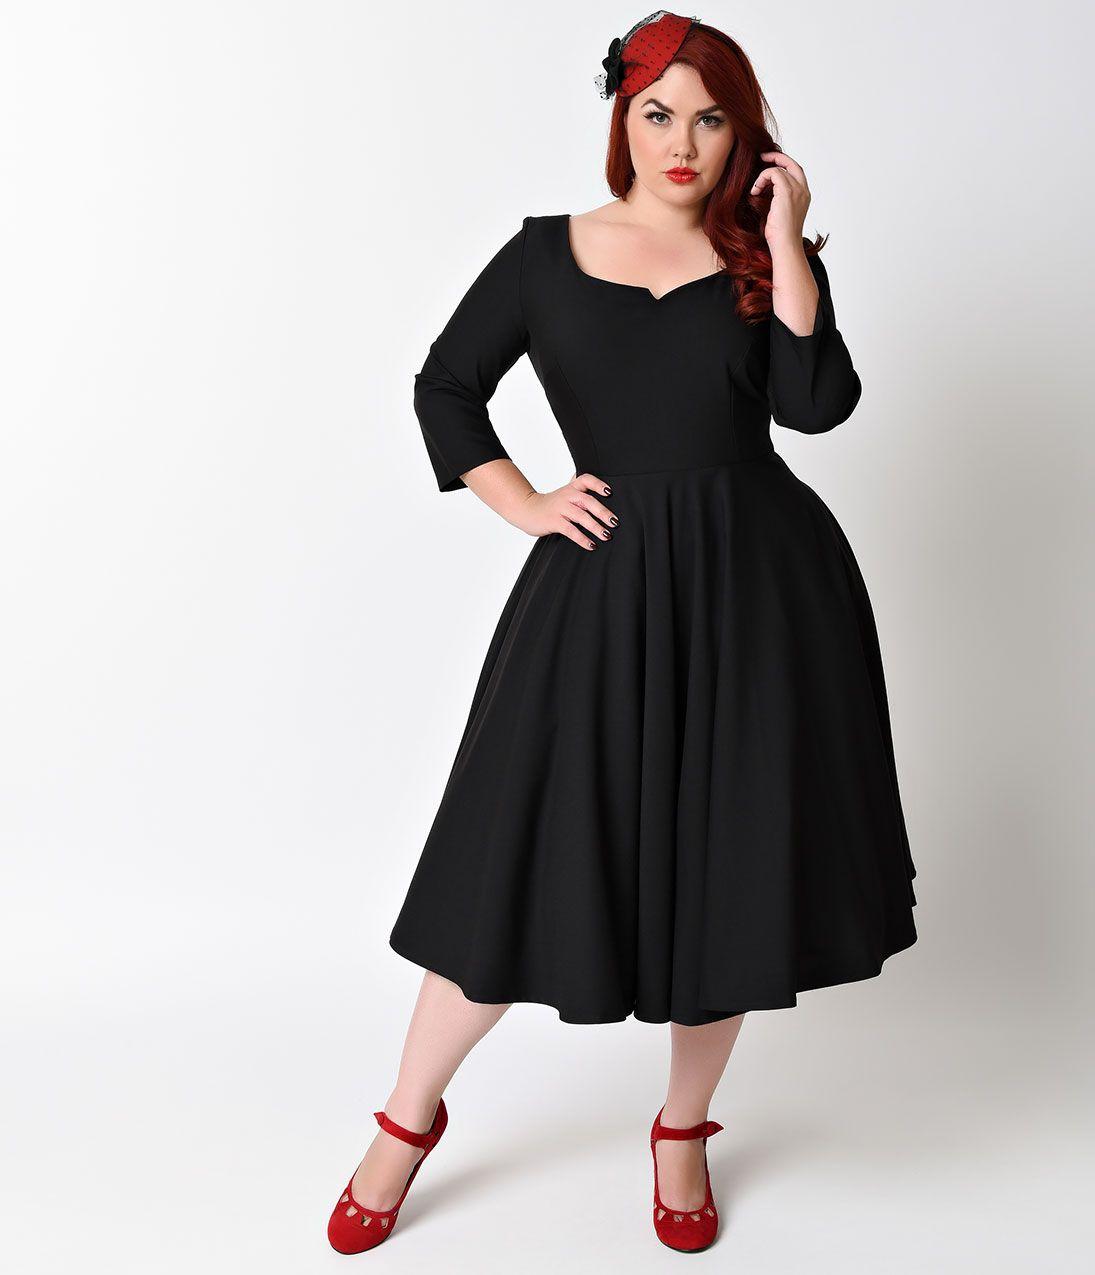 vintage cocktail dresses, party dresses, prom dresses   quarter